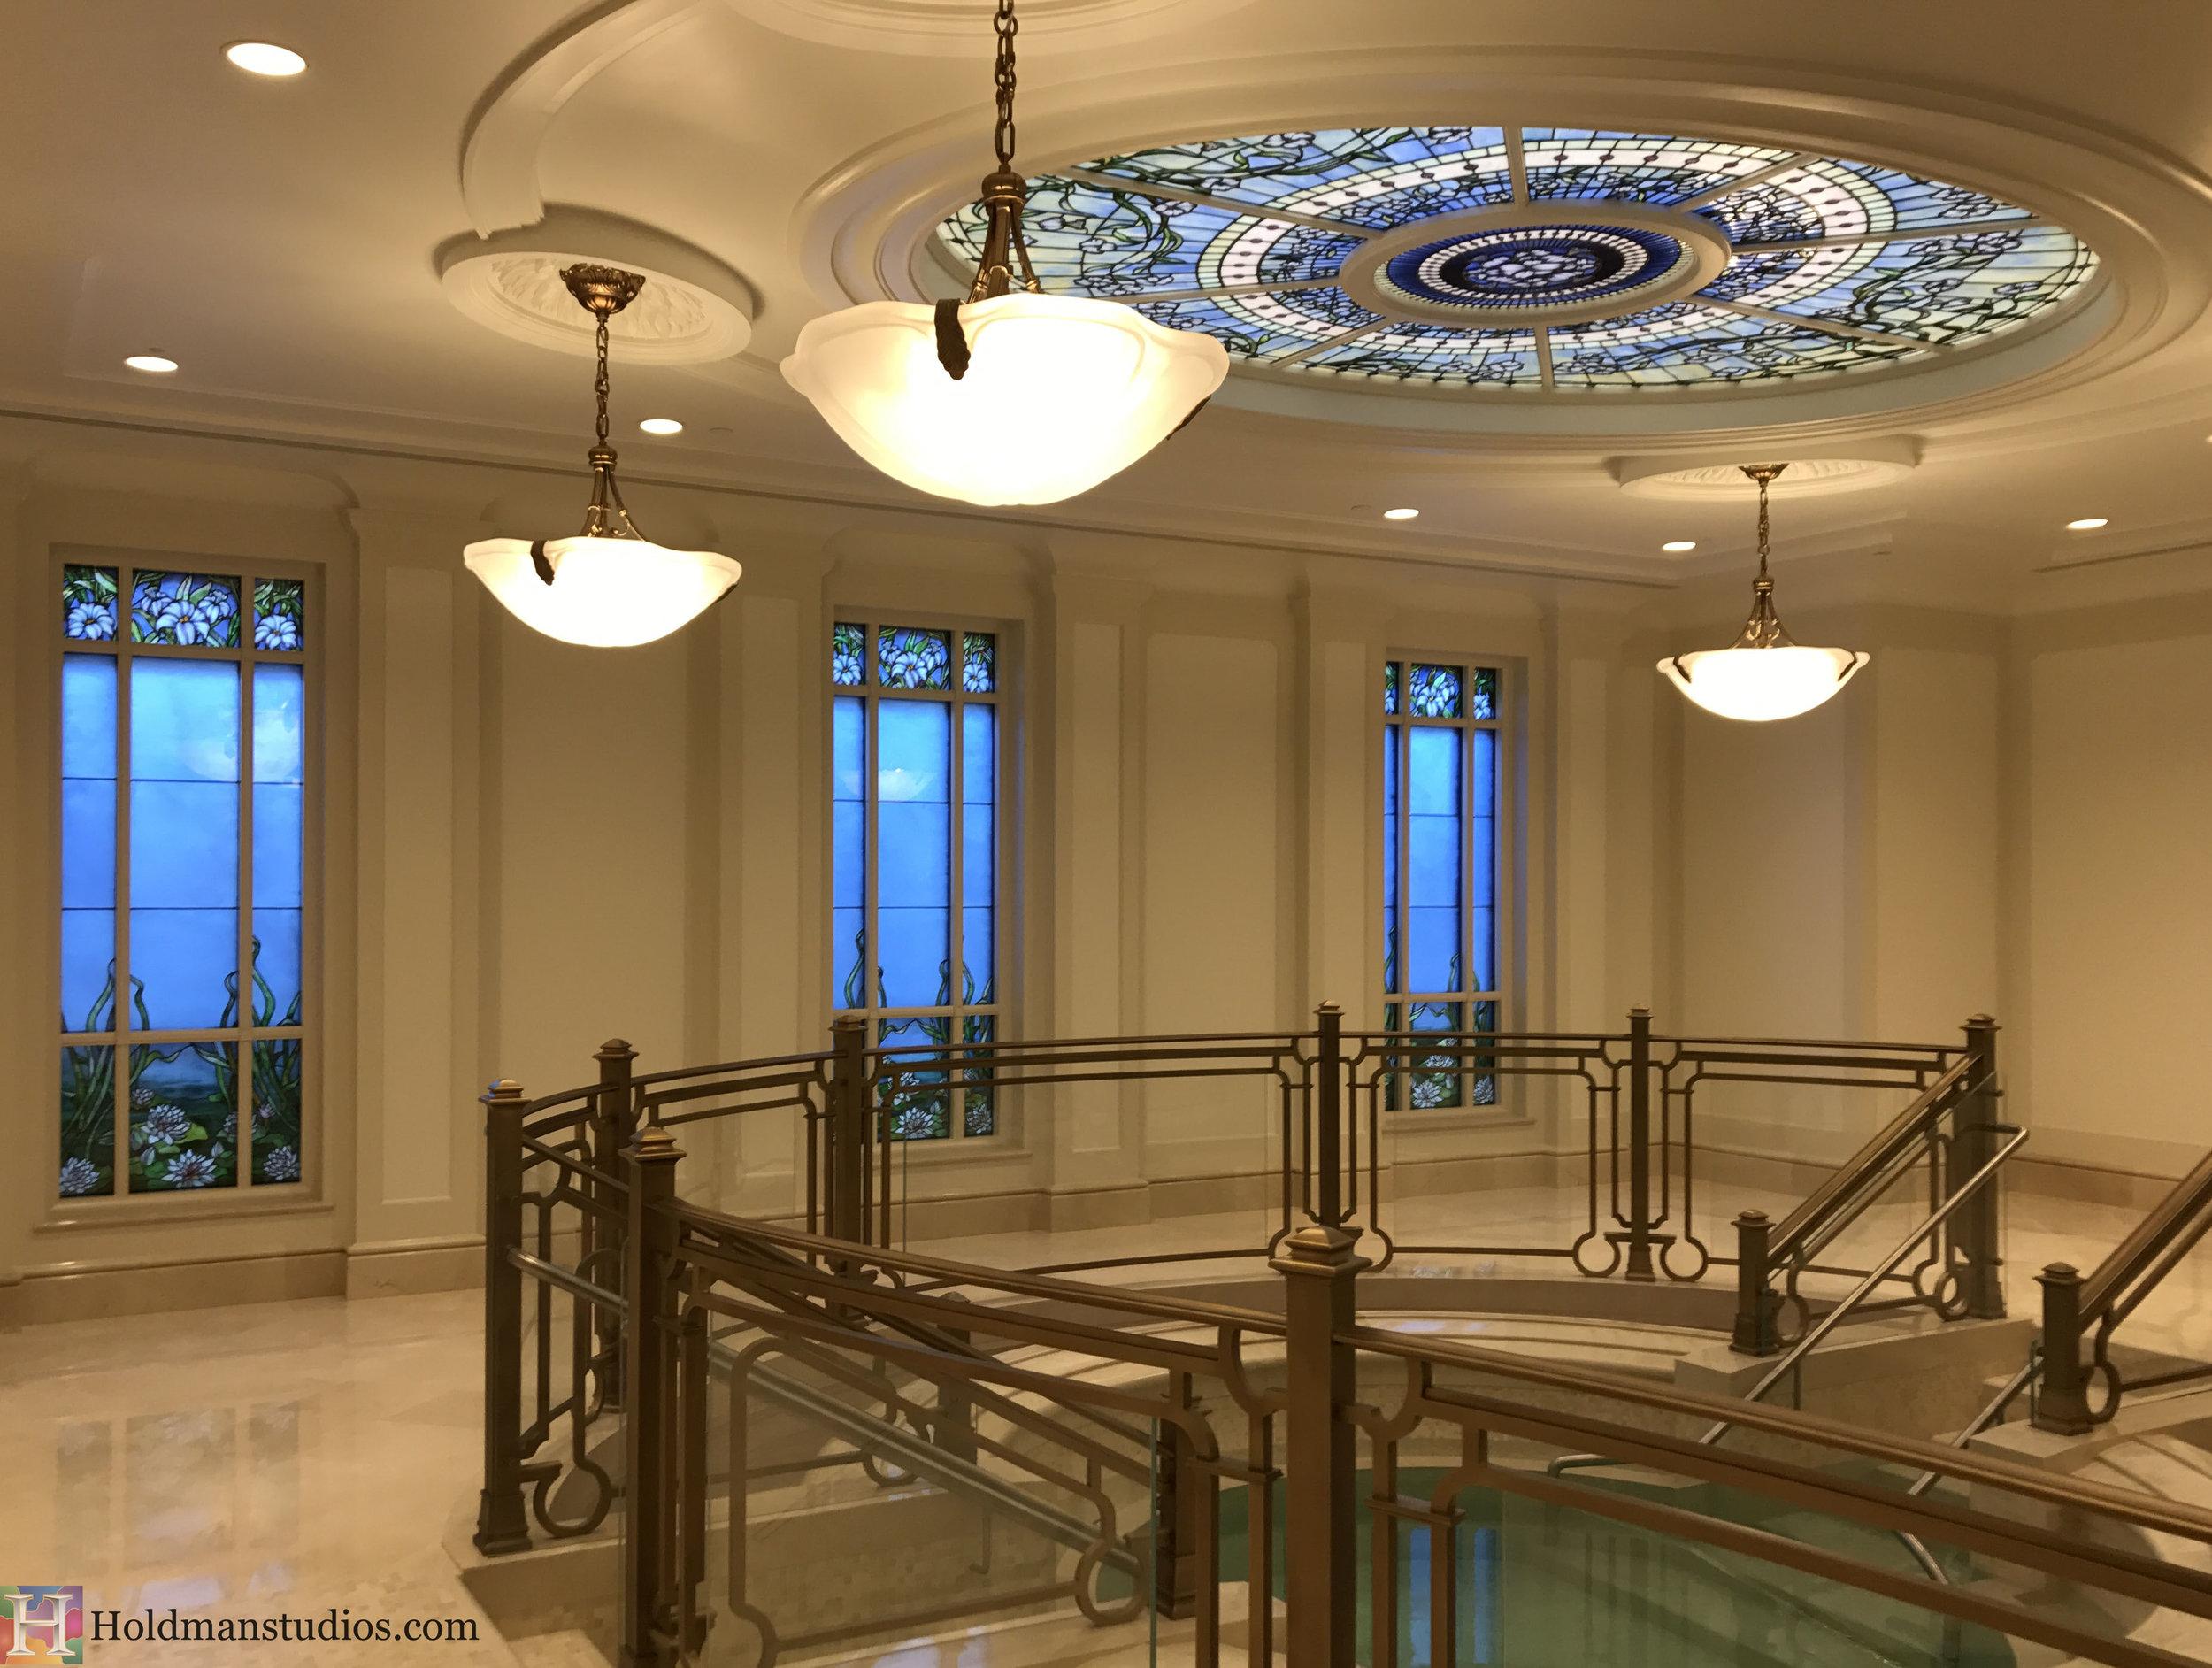 Holdman-Studios-Stained-Glass-Paris-LDS-Temple-Madonna-Martagon-Water-Lily-Pads-Flowers-Leaves-Sun-Moon-Stars-Skylight-Windows.jpg